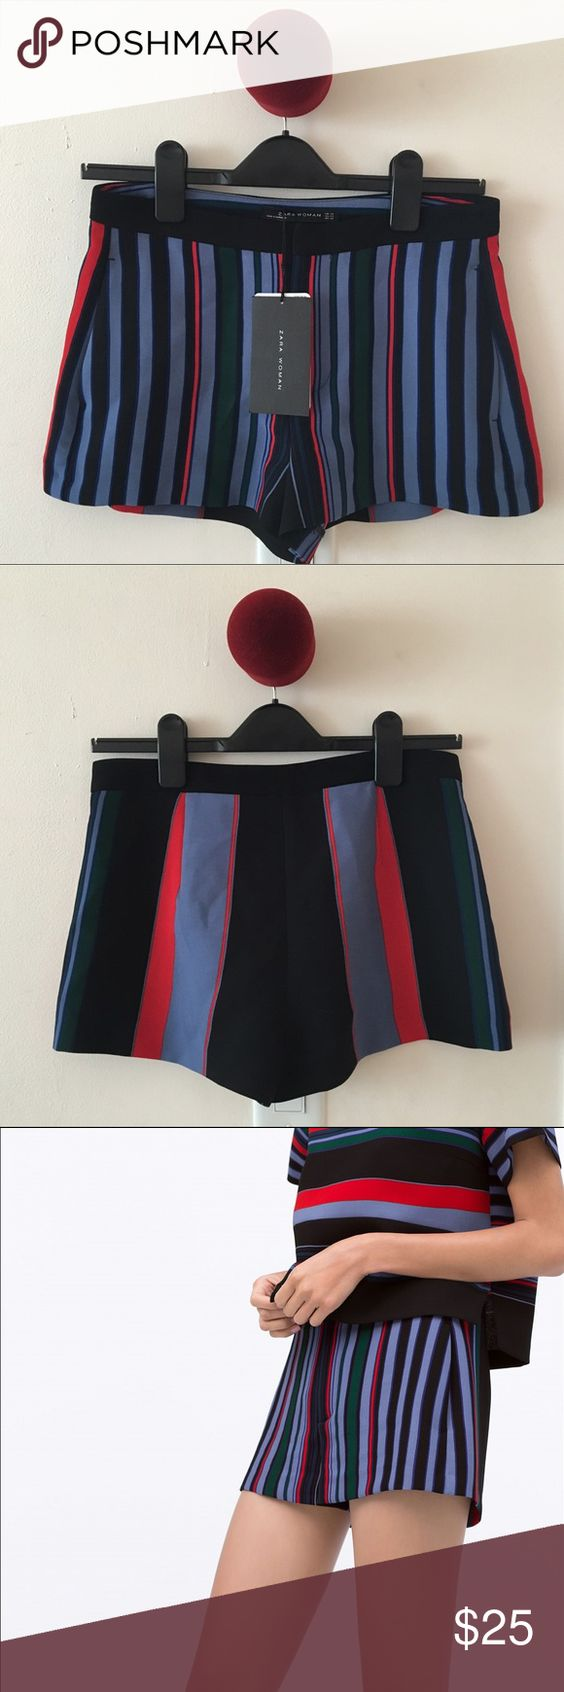 NWT Zara multicolored stripe shorts (sz XS) High rise multicolored stripe shorts from Zara. Inseam of ~2in. 100% polyester. Never worn, NWT. Zara Shorts